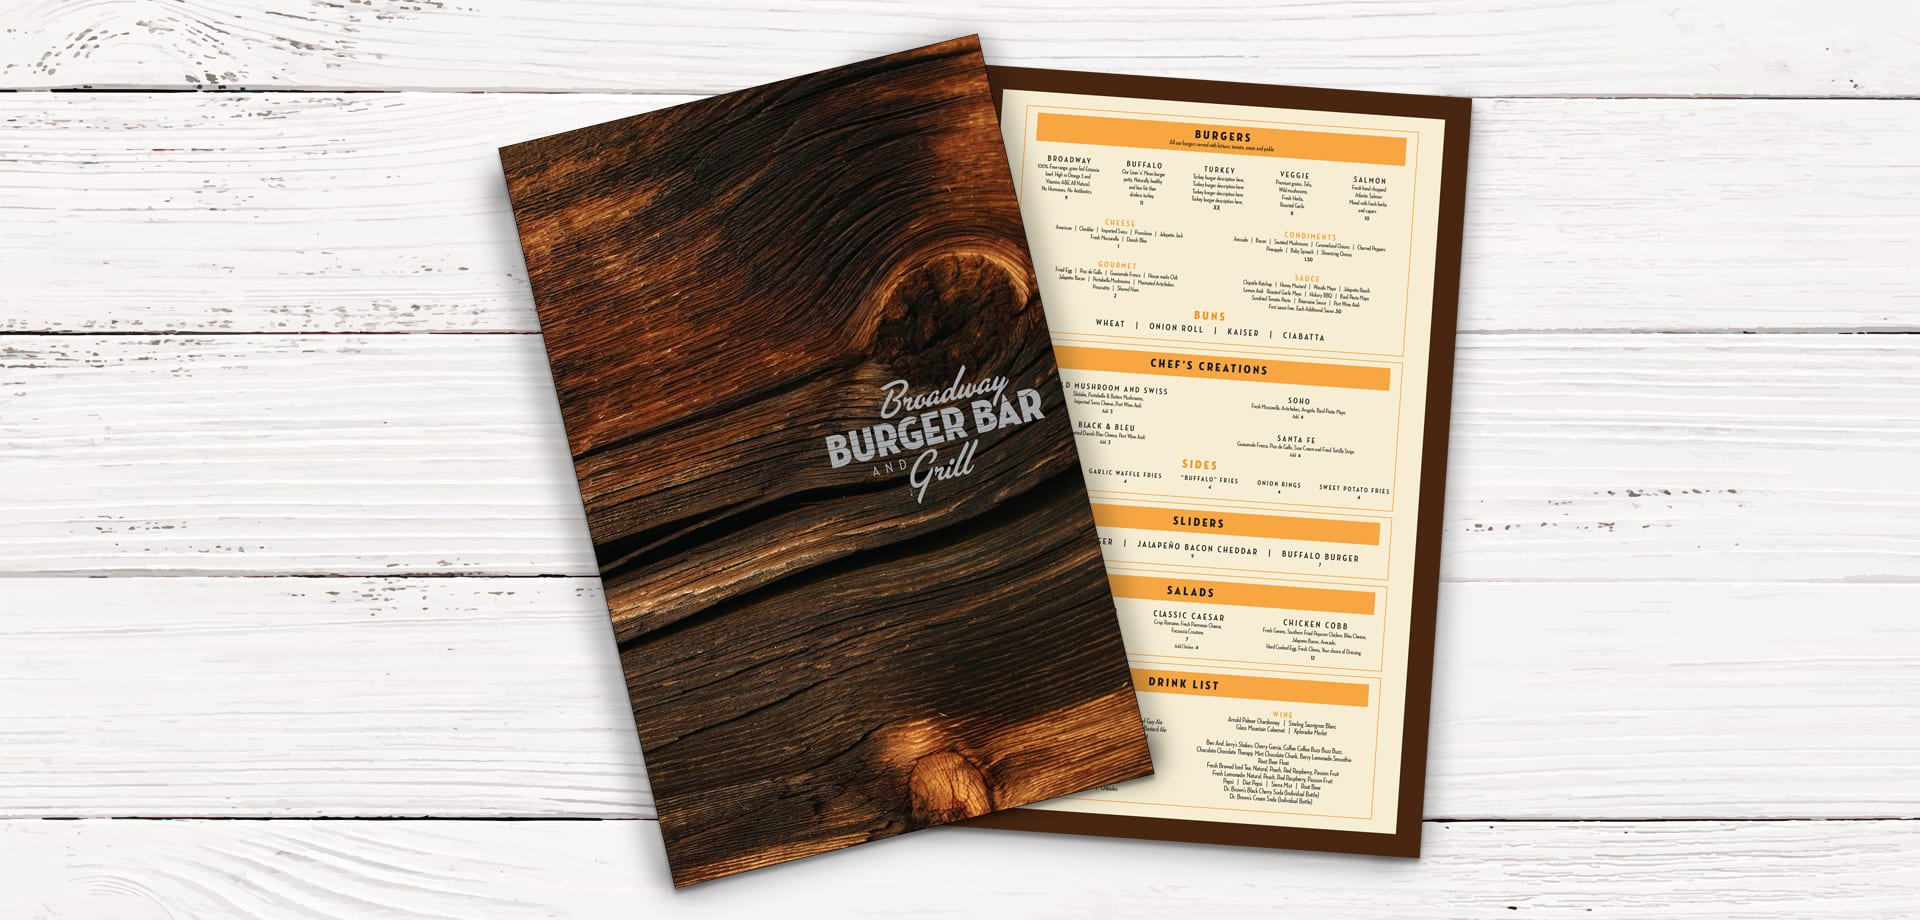 Broadway Burger Bar and Grill menu